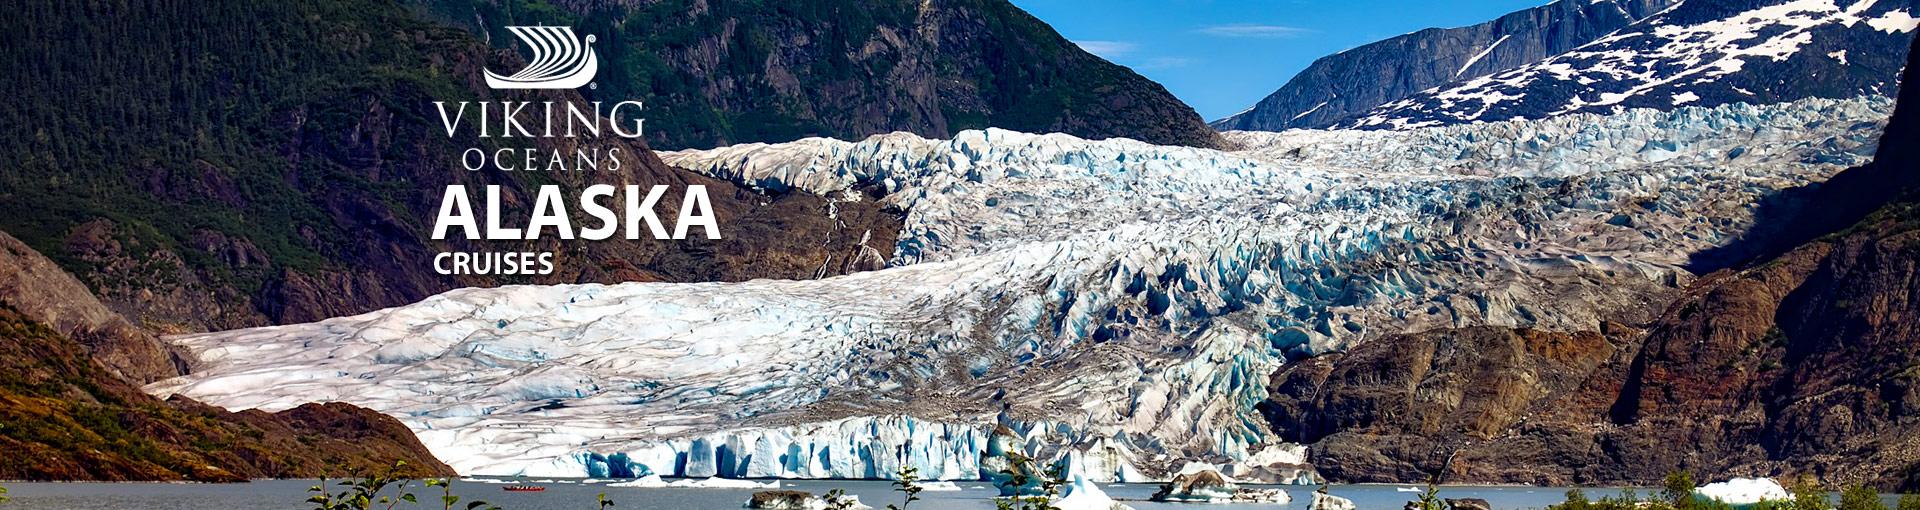 Viking Oceans Alaska Cruises